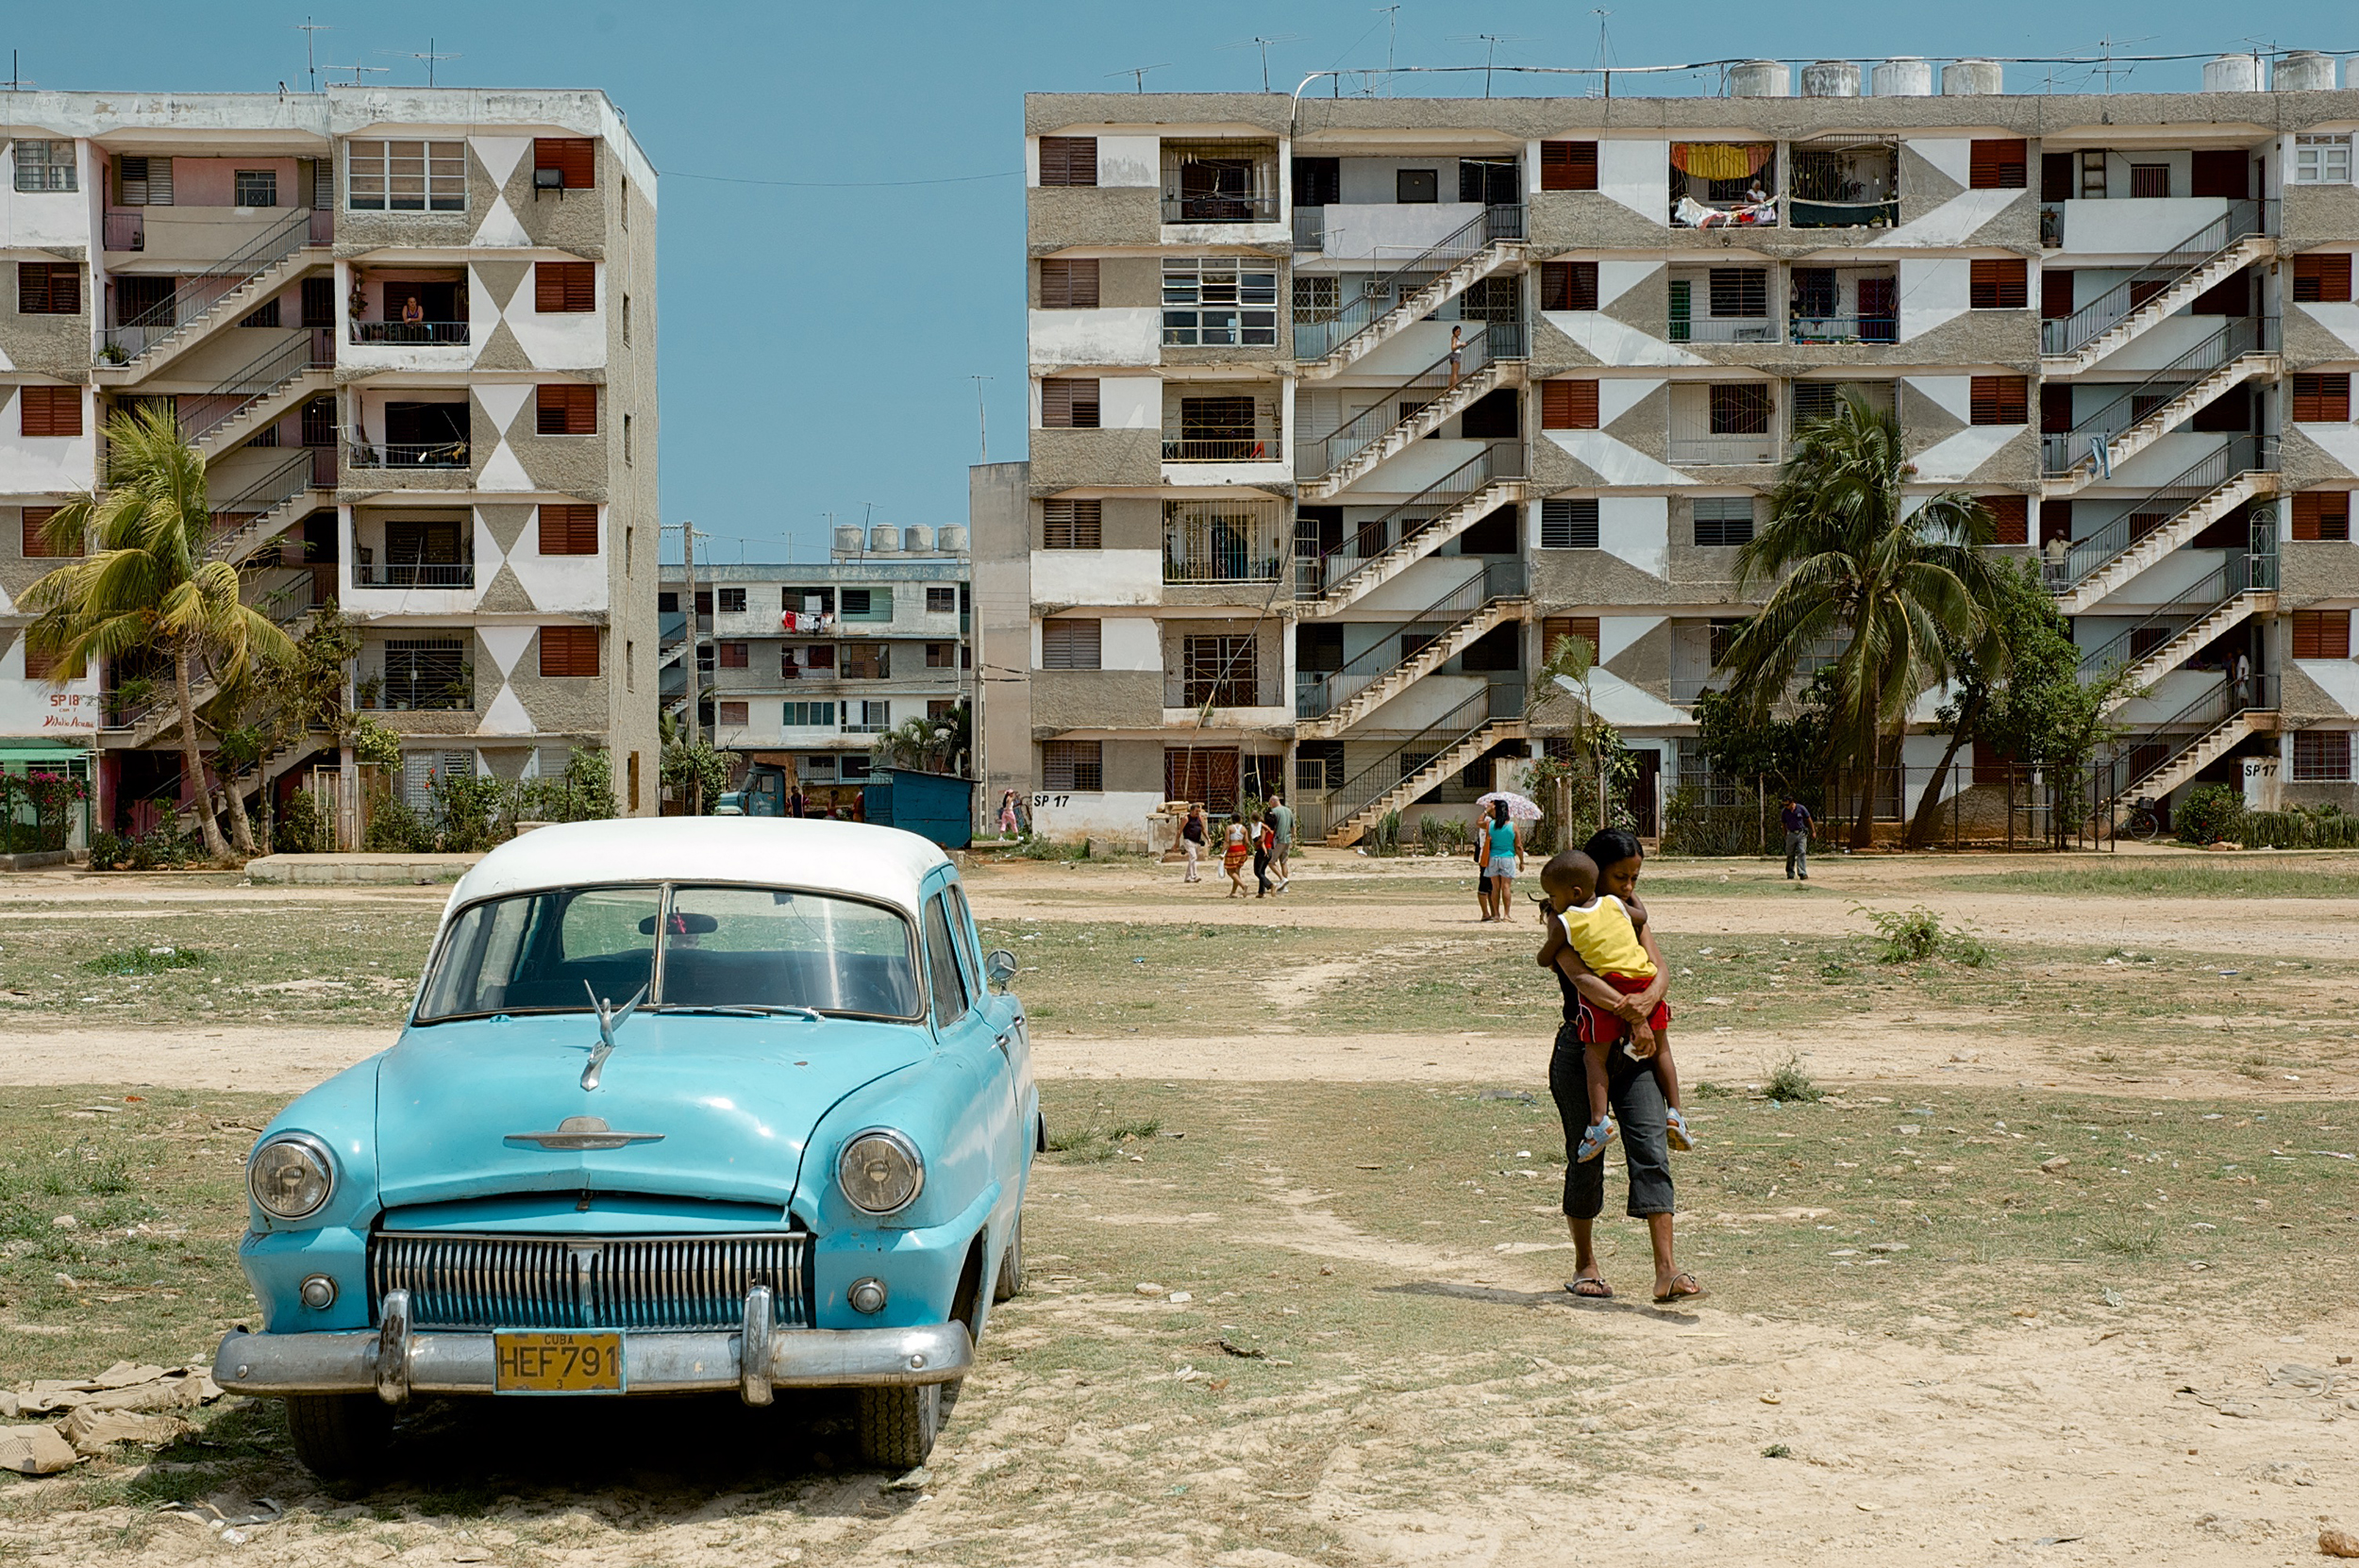 La Habana-Cuba-book 161